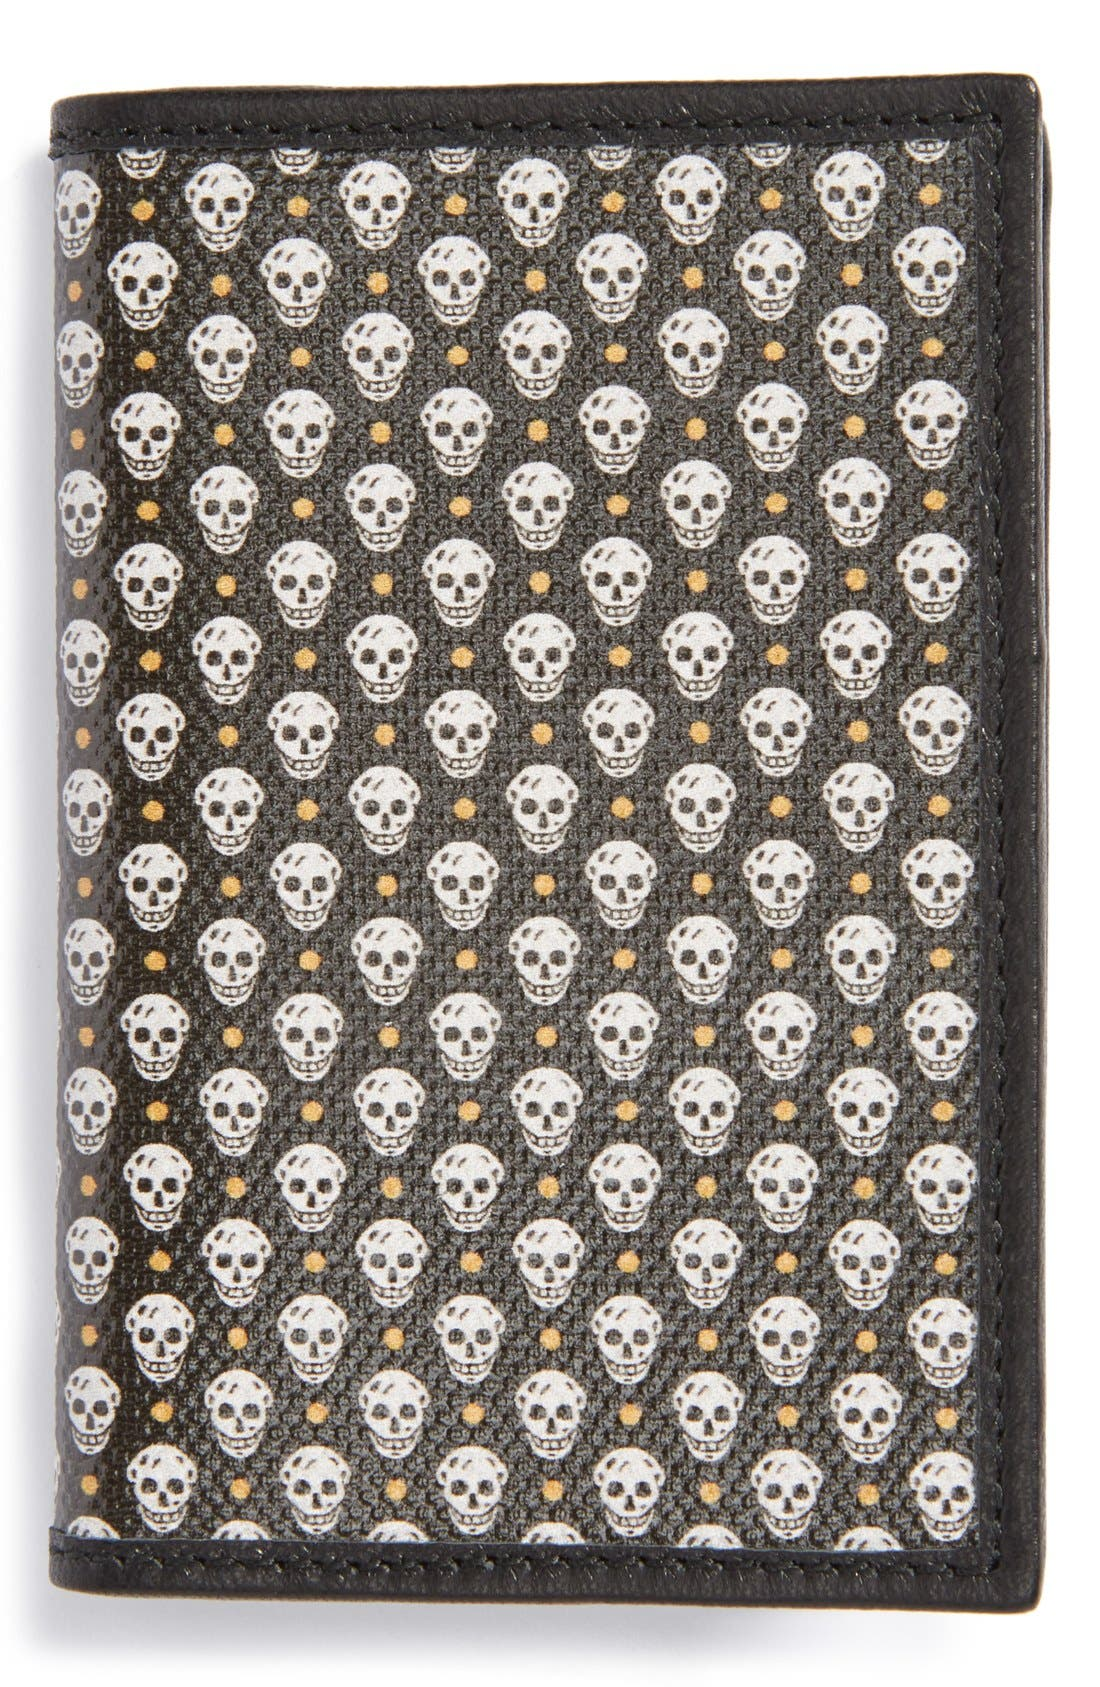 Alternate Image 1 Selected - Alexander McQueen Skull Print Leather Card Holder